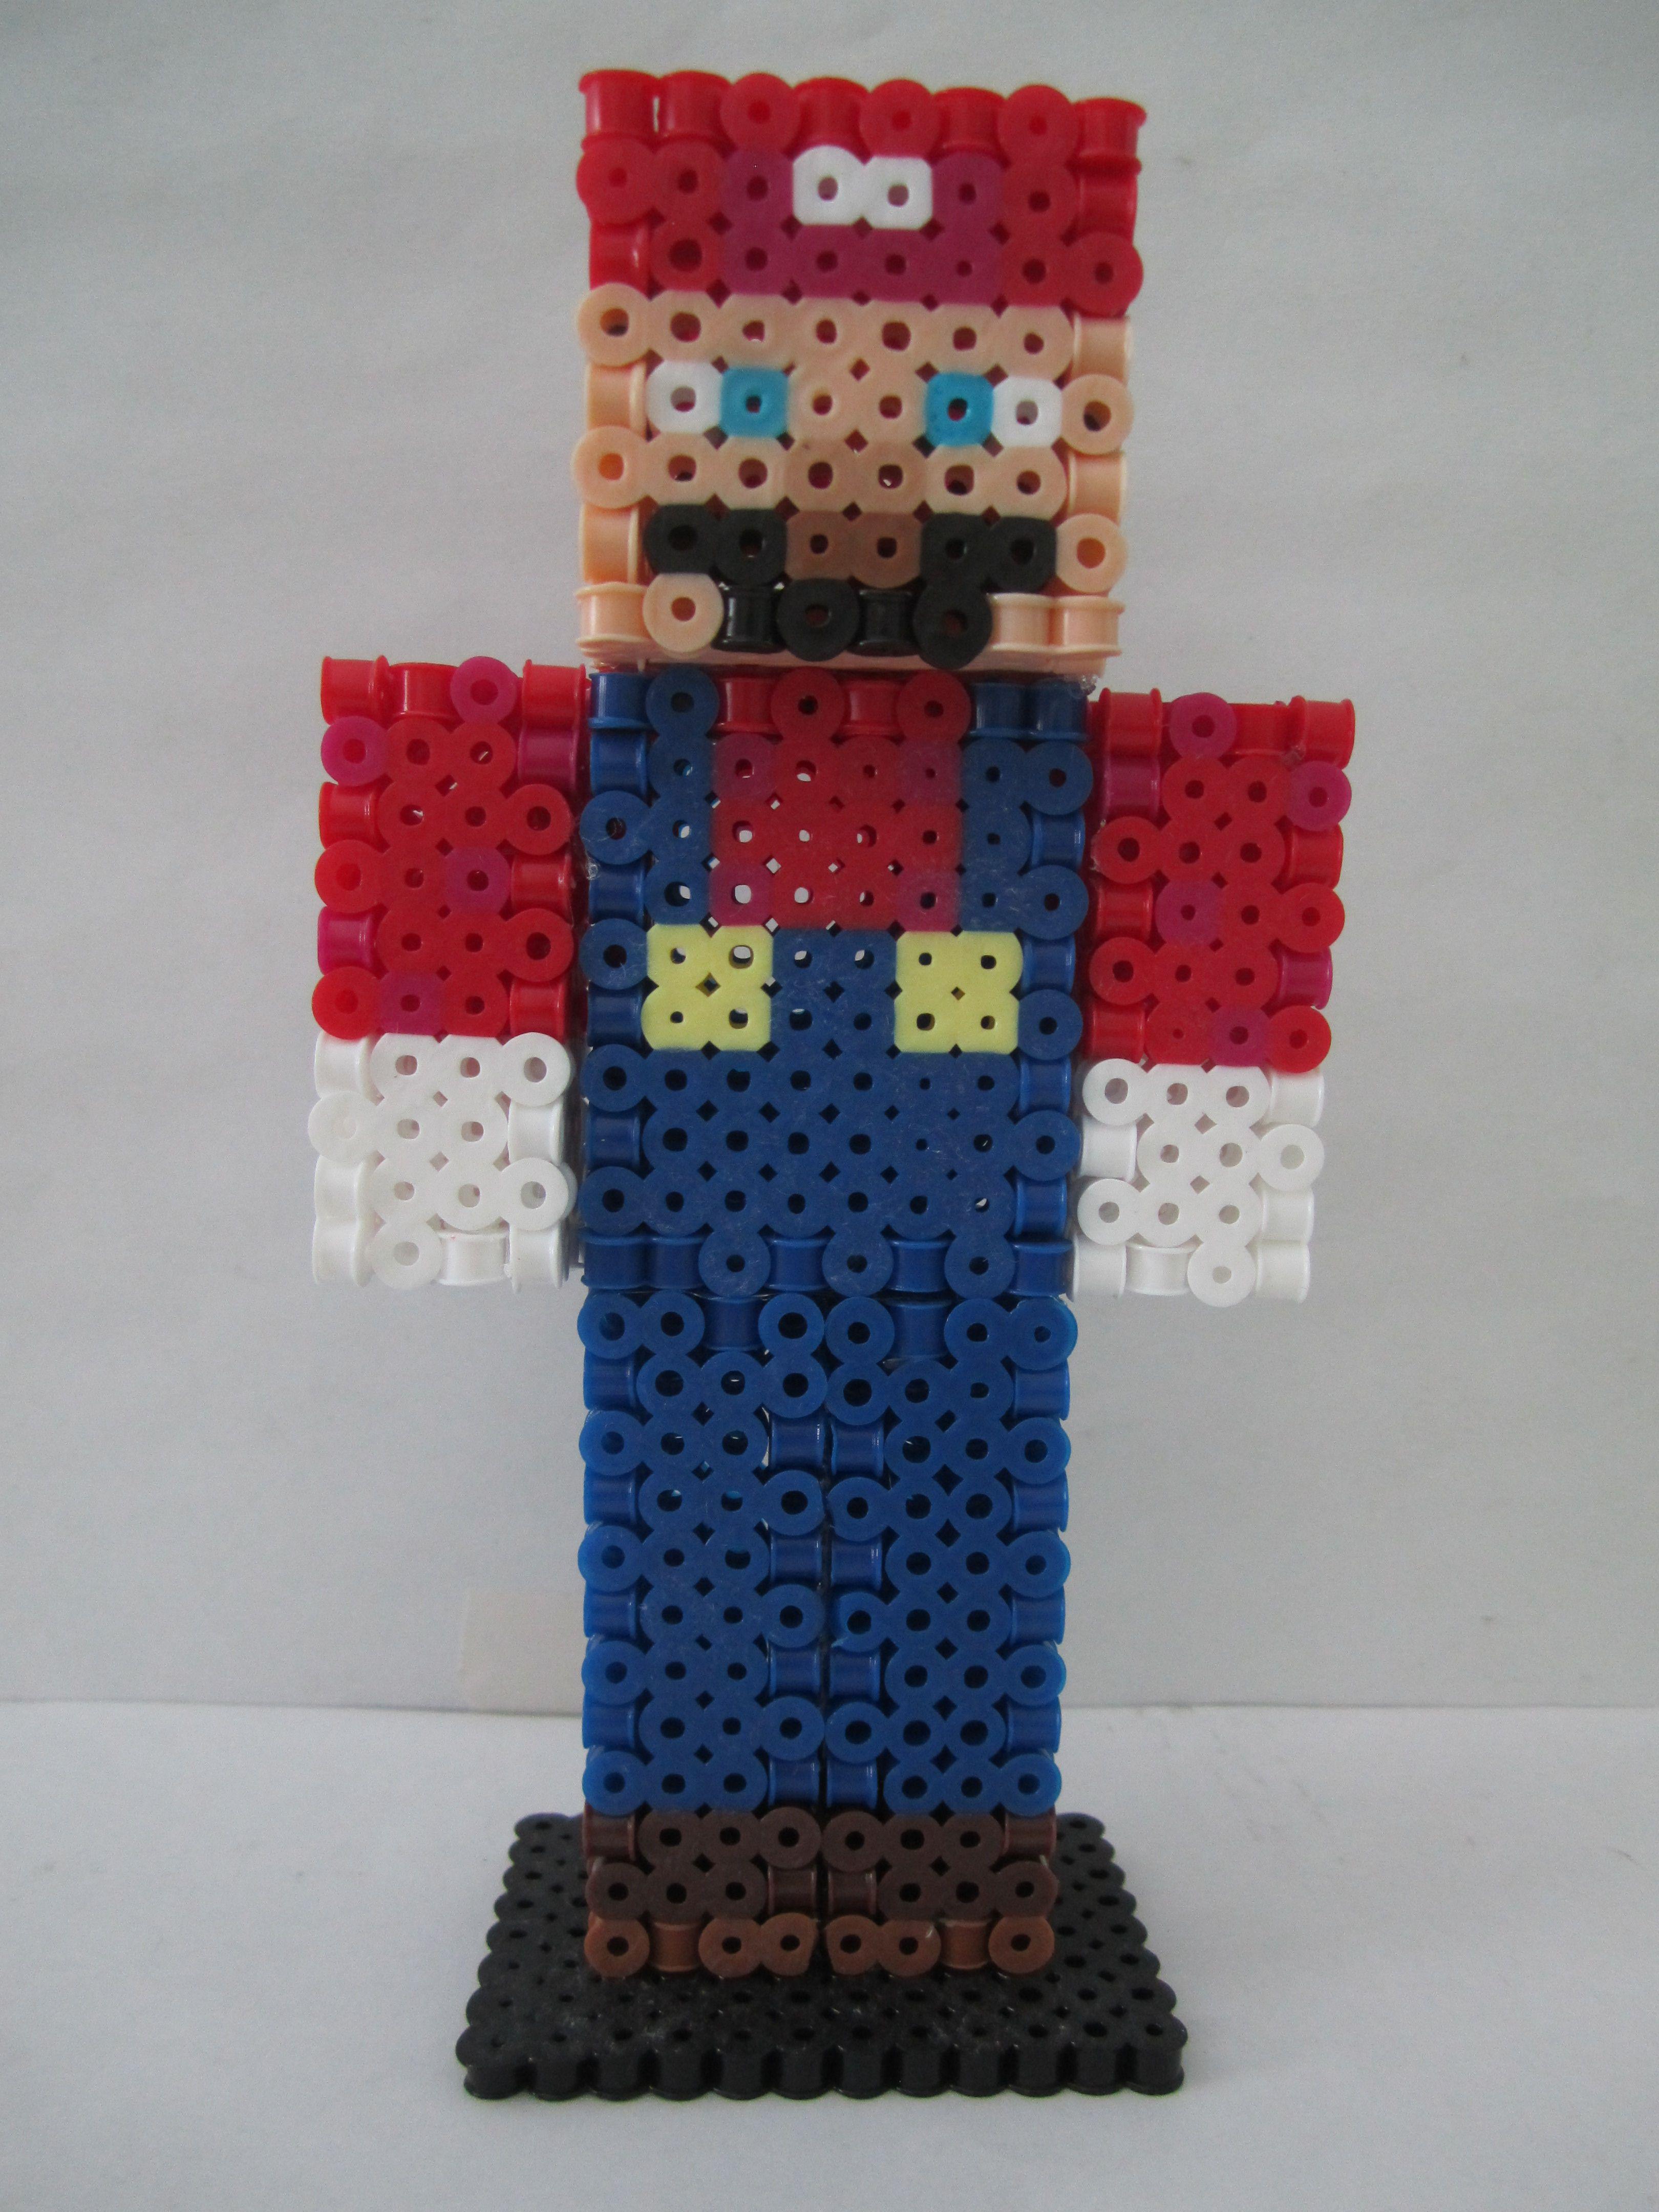 9D Mario Minecraft Skin Perler Beads by Angela Albergo  Perler